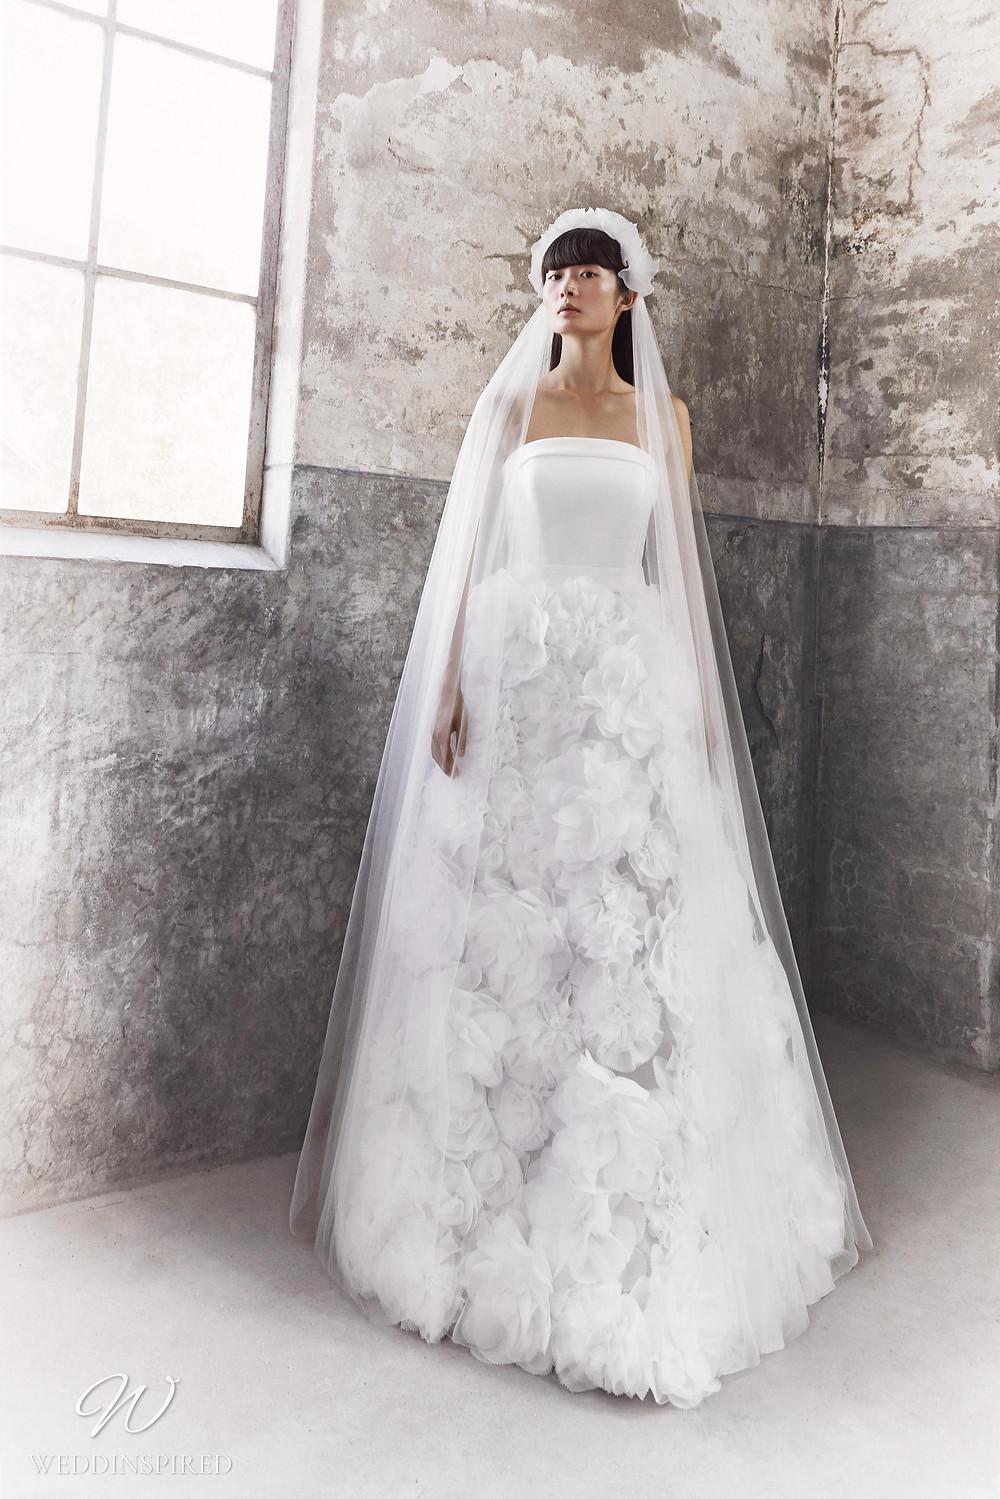 A Viktor & Rolf Fall/Winter 2021 strapless A-line wedding dress with a ruffle tulle flower skirt